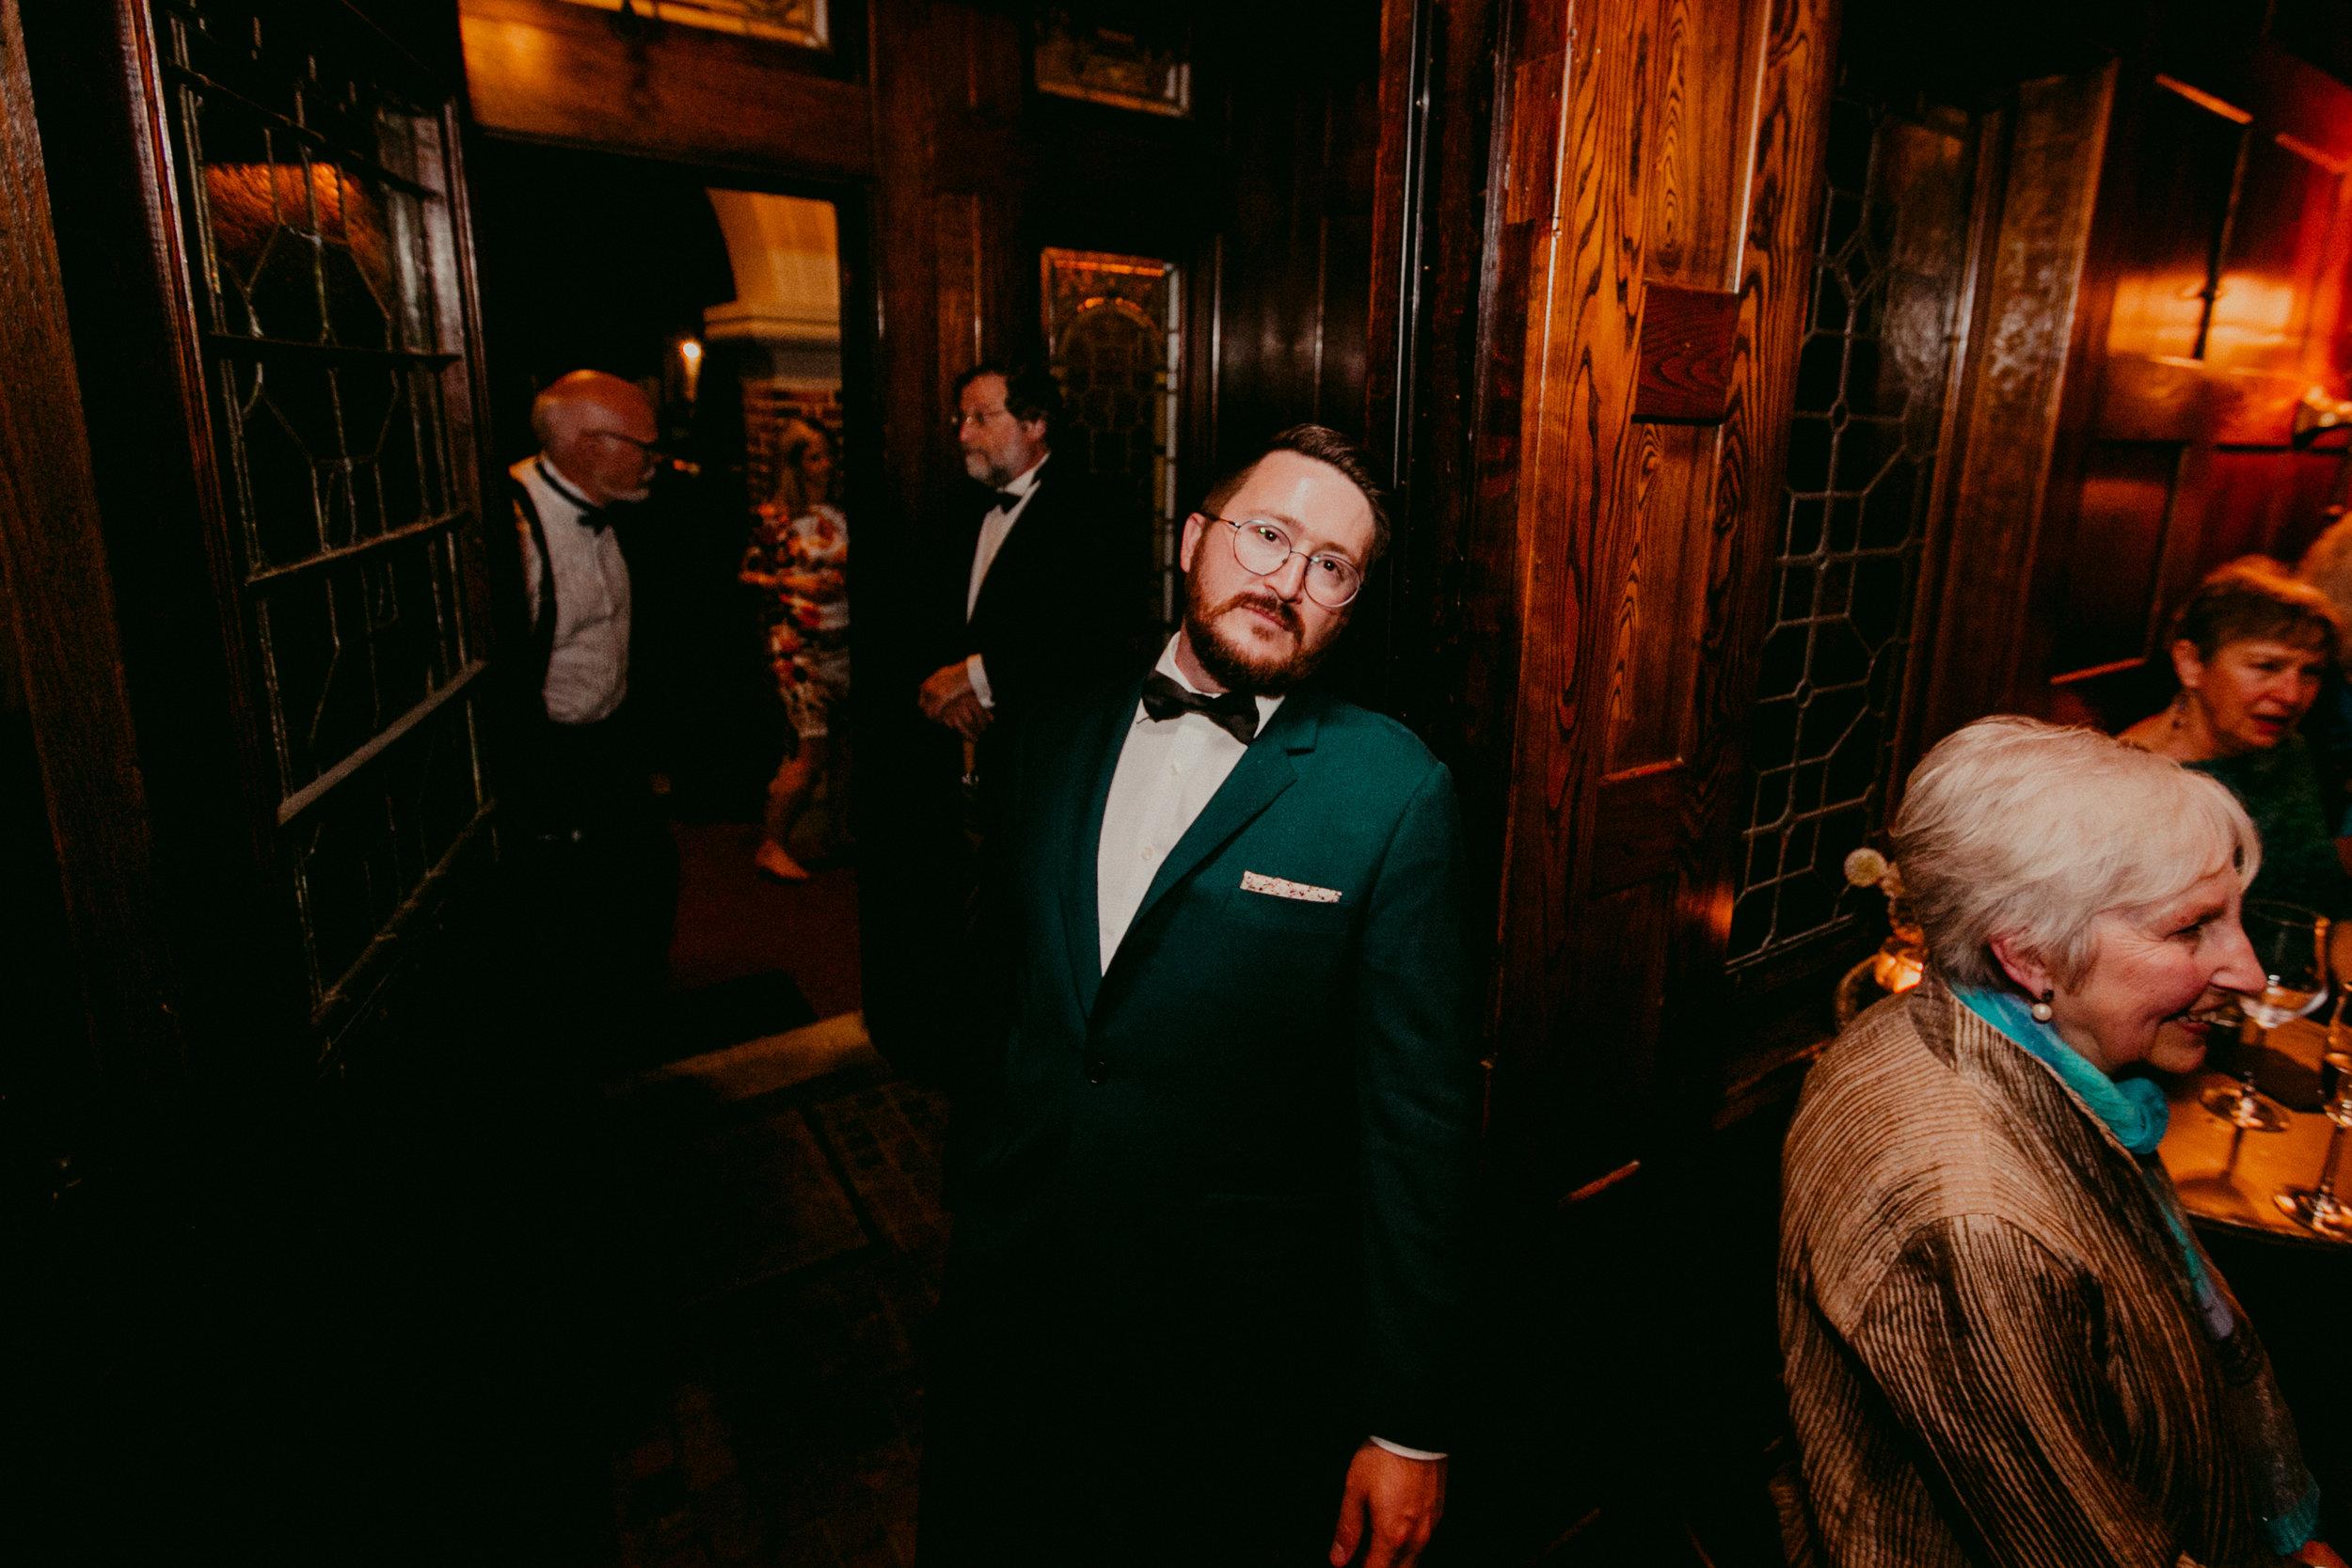 Tiger_House_The_Inn_at_Hudson-Wedding_Chellise_Michael_Photography-583.jpg